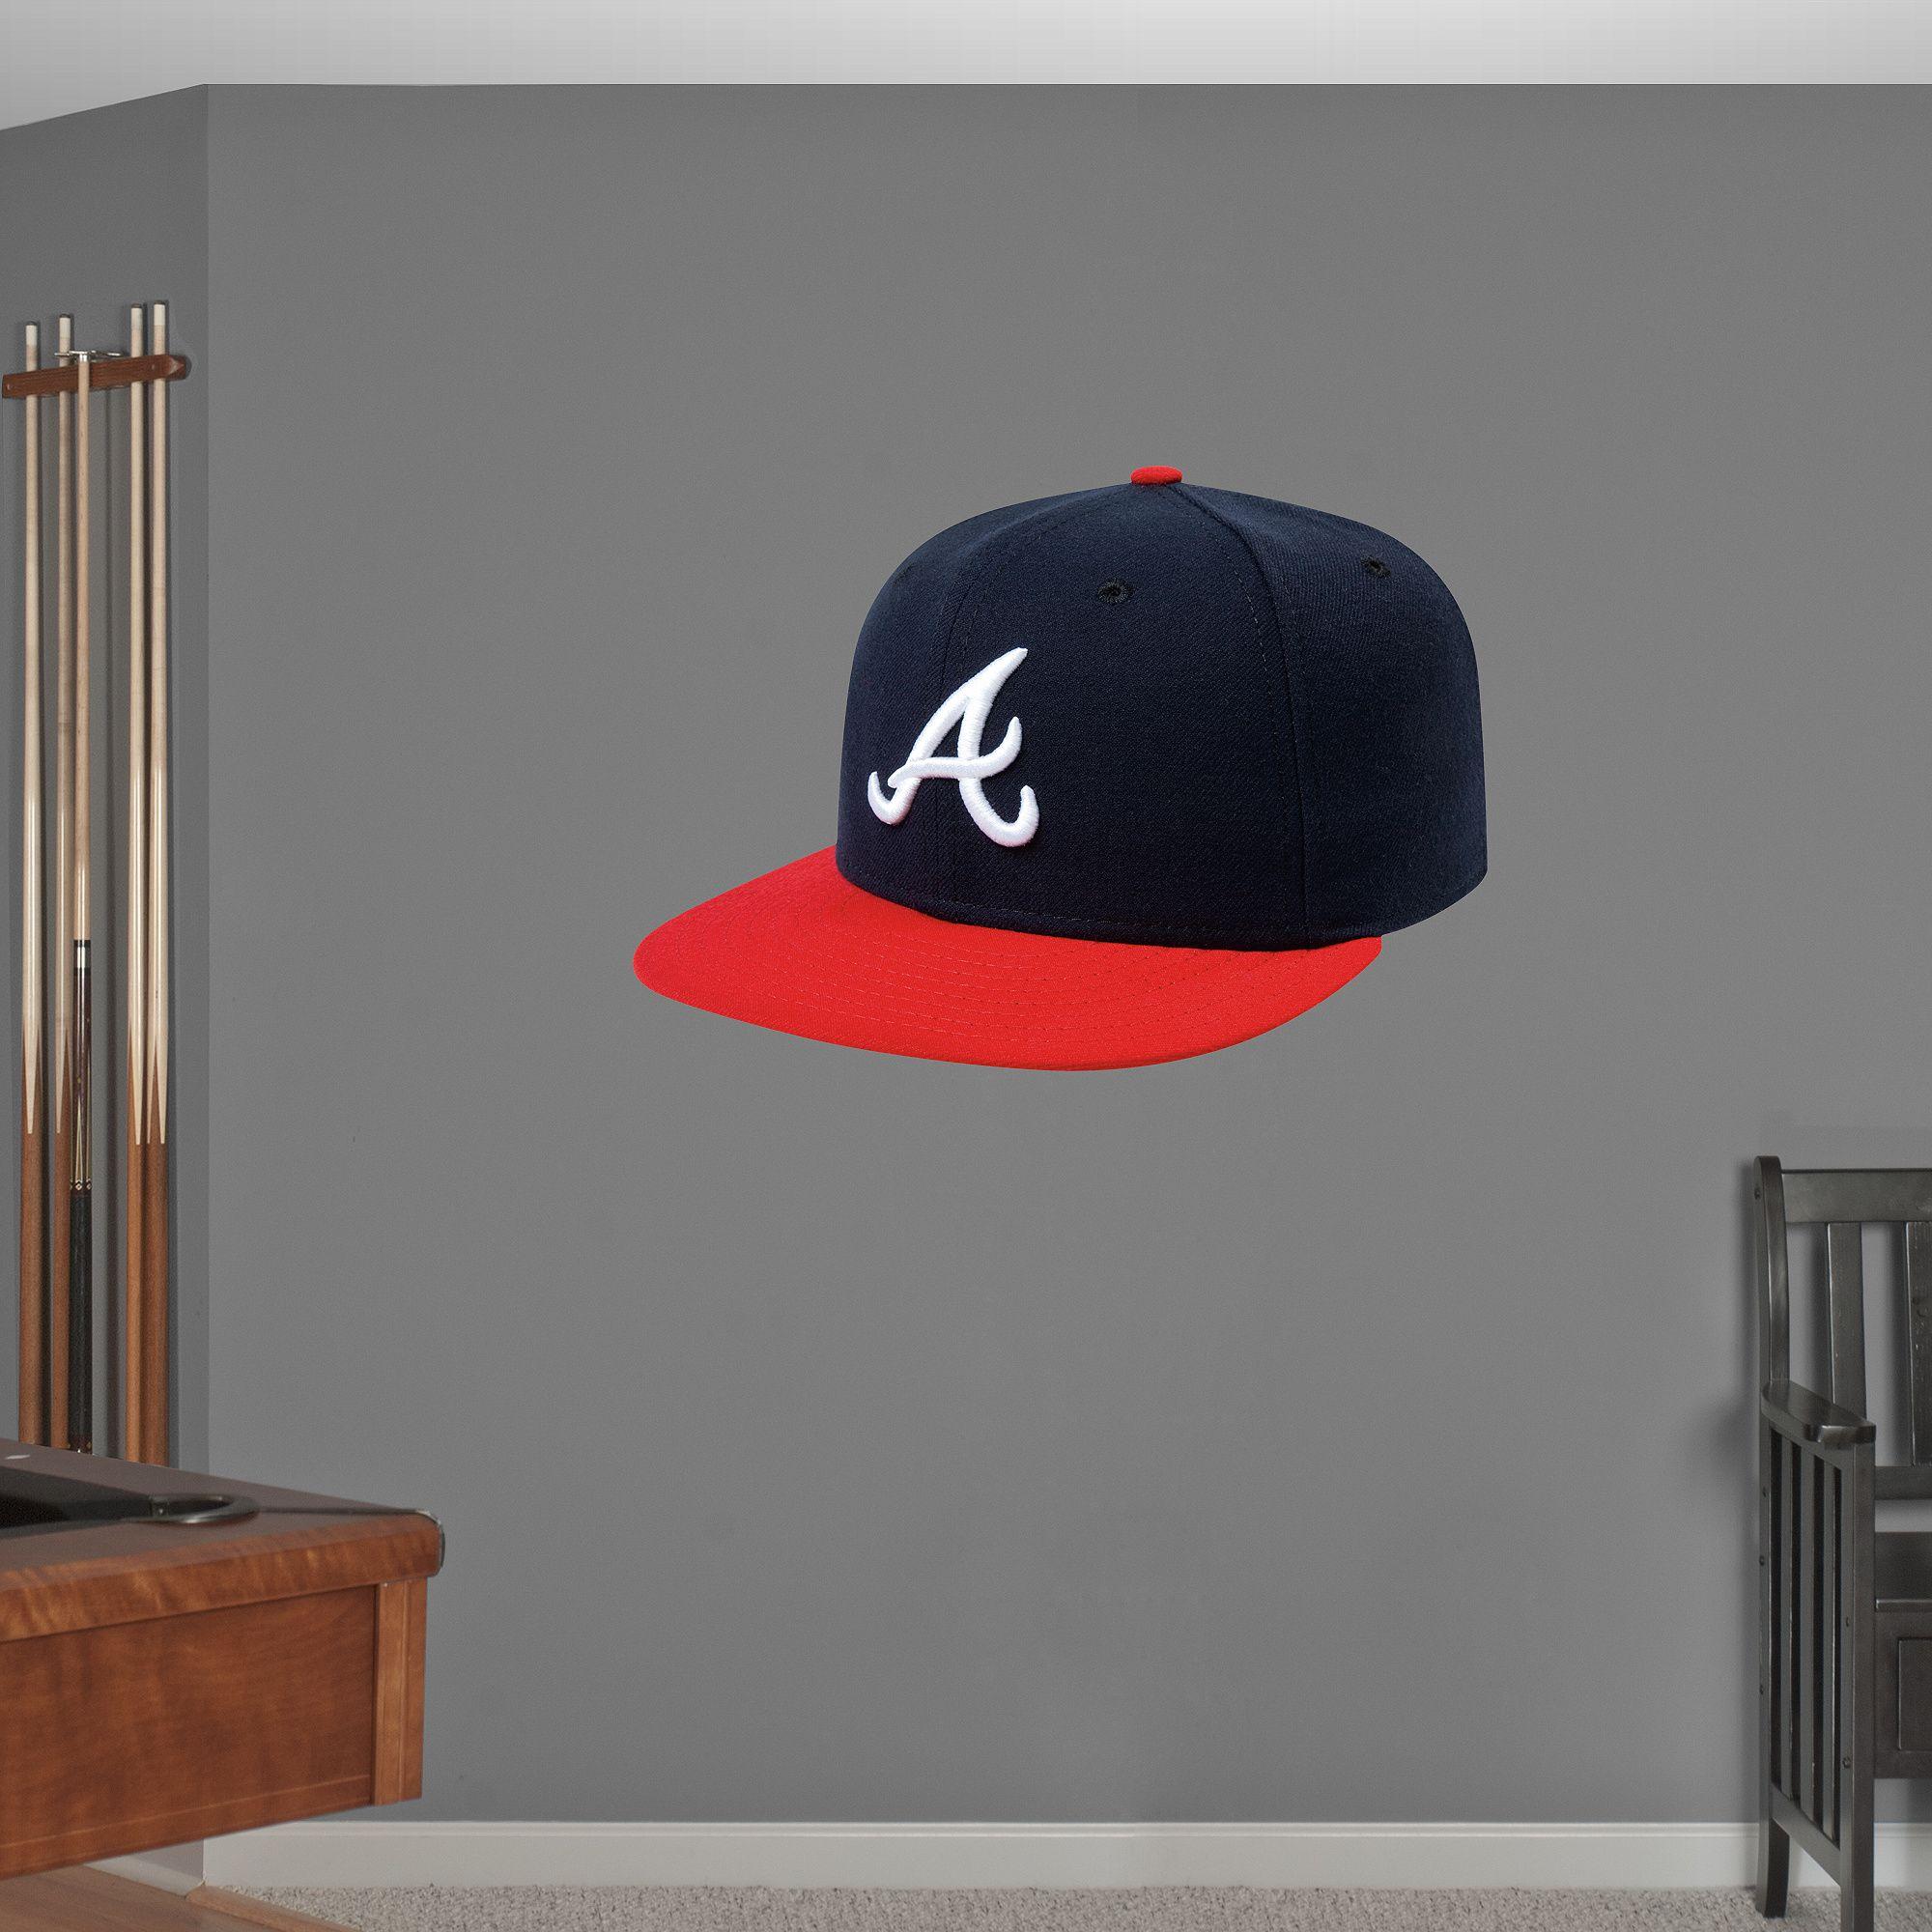 Fathead Wall Graphic - Atlanta Braves Wall Decal -